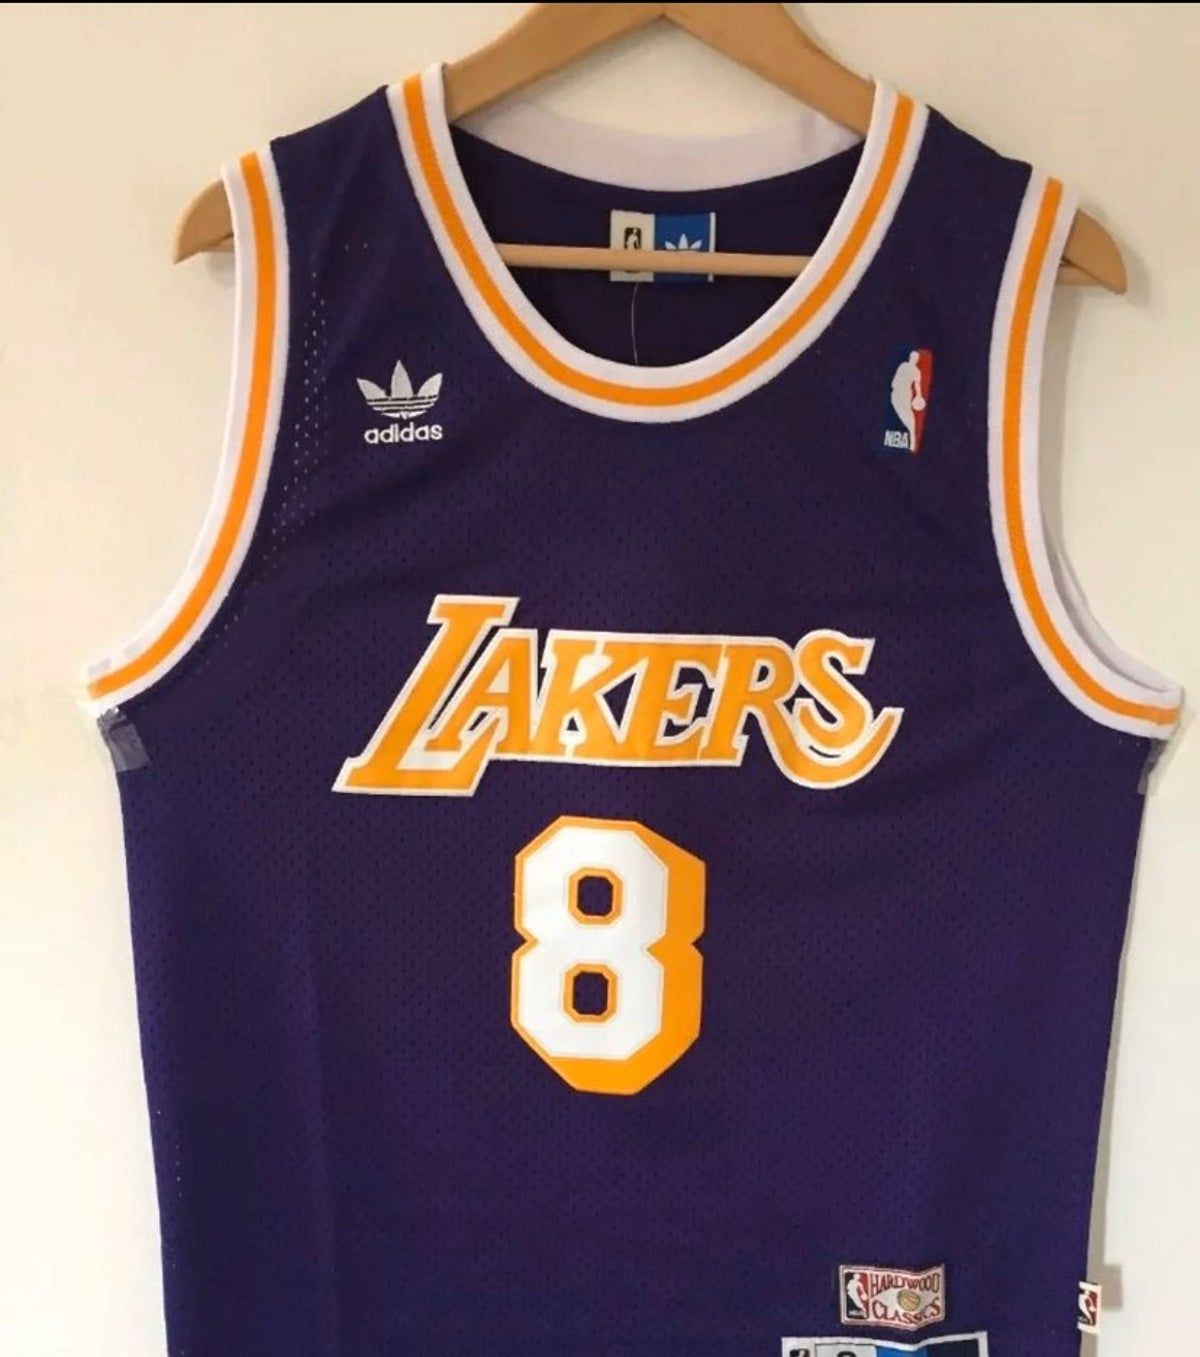 Kobe Bryant Retro Jersey #8 Lakers sz M | Kobe bryant, Jersey, Kobe